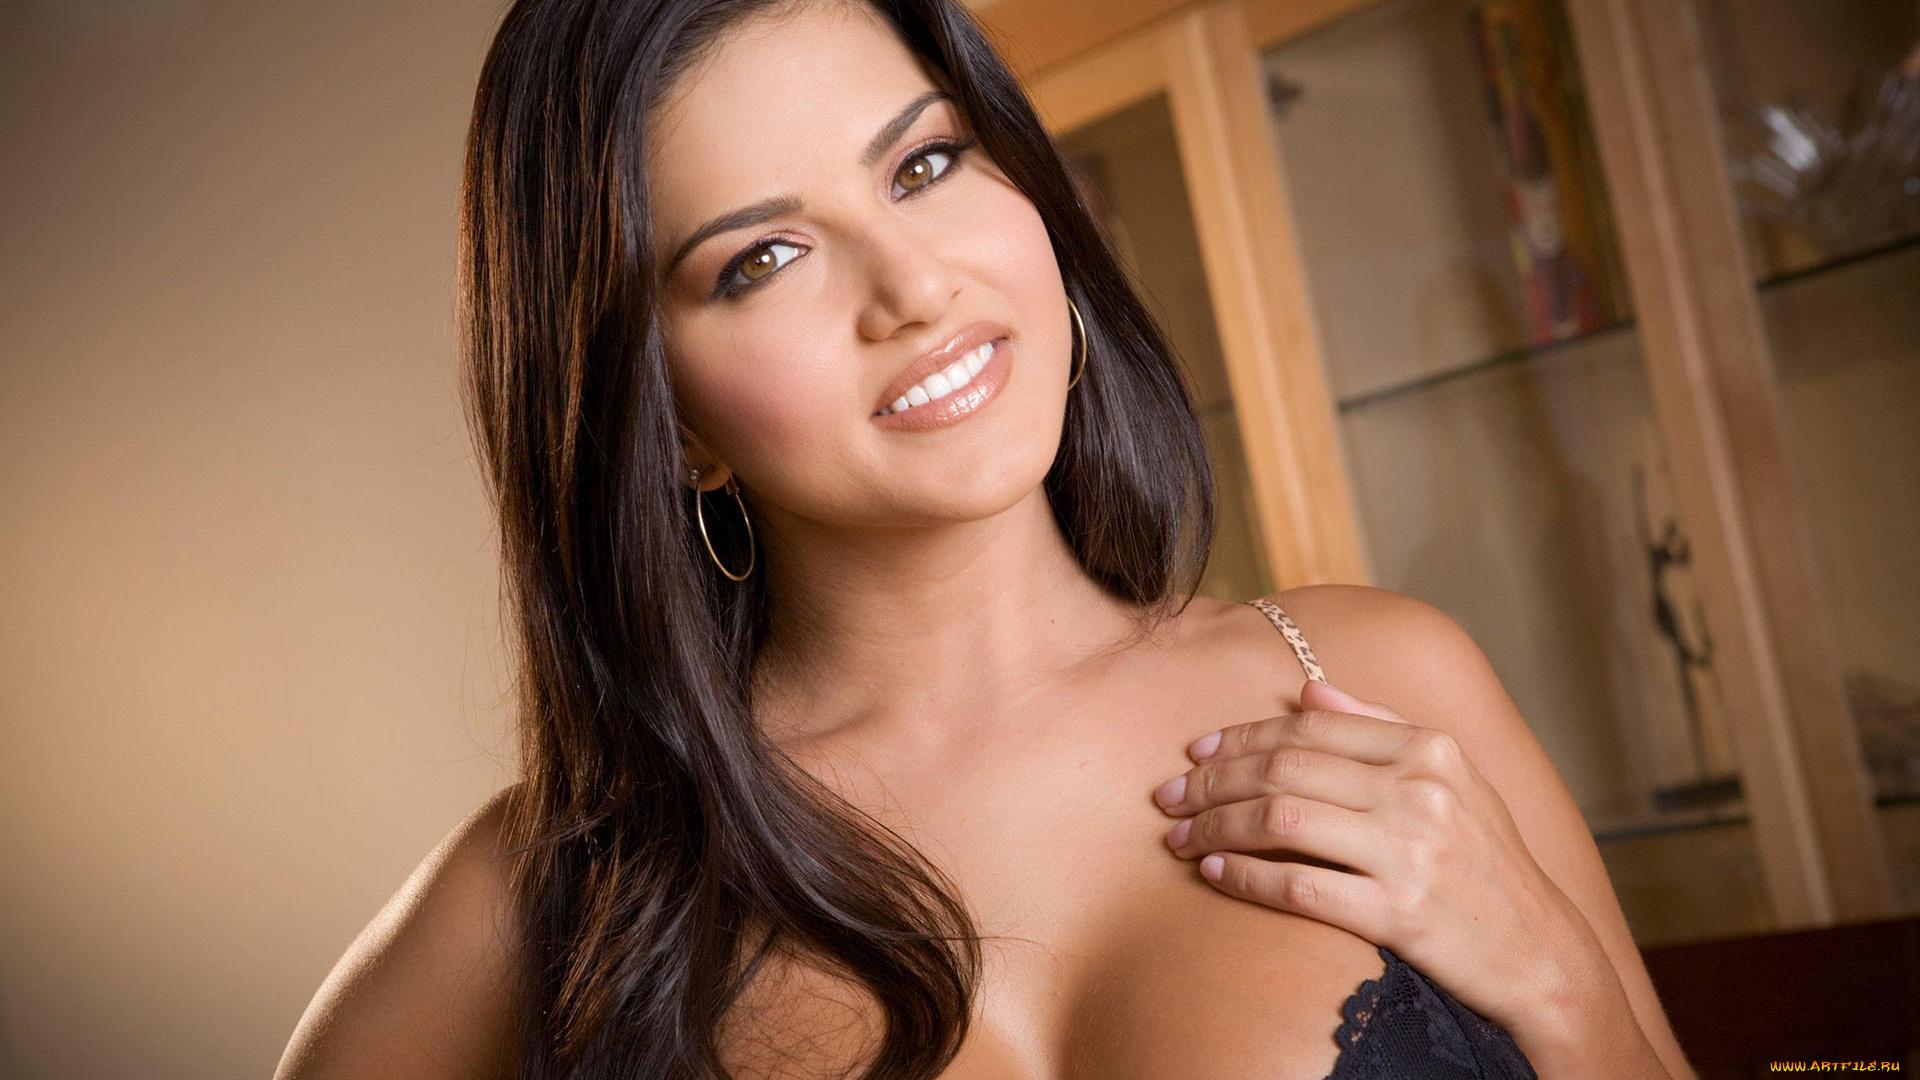 Erica ellyson nudes